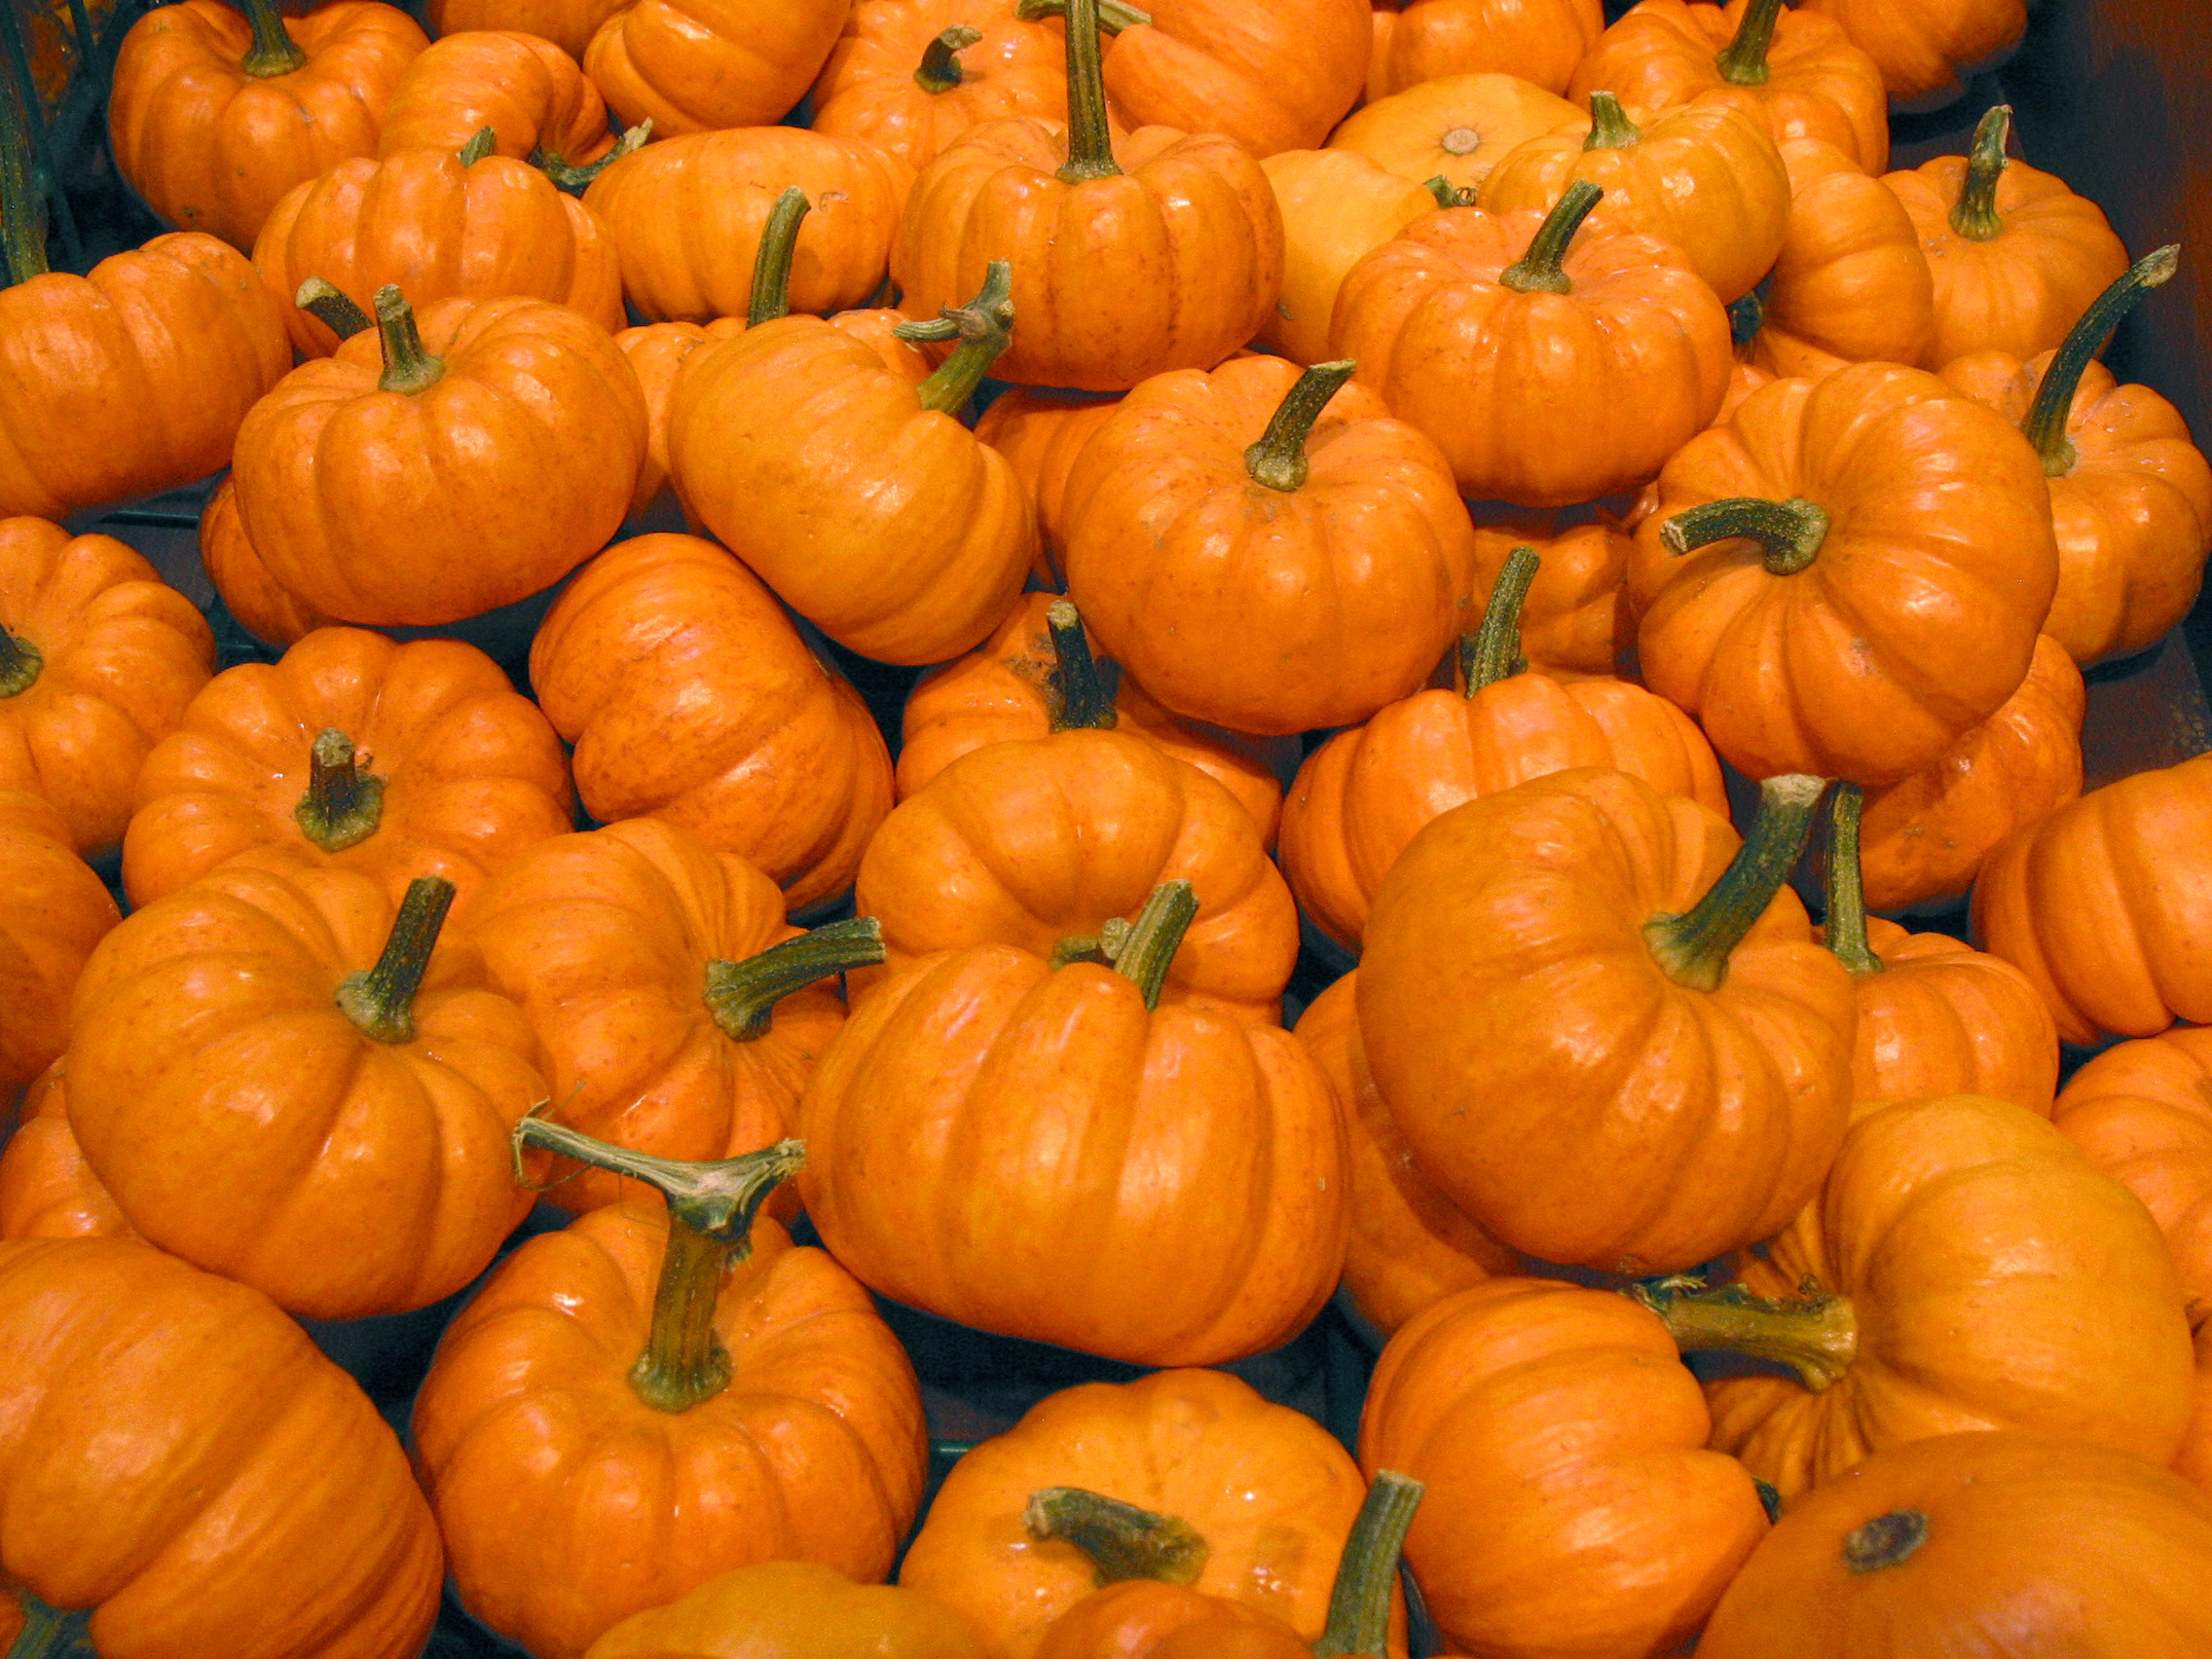 pumpkin free stock photo image picture mini pumpkins gourds